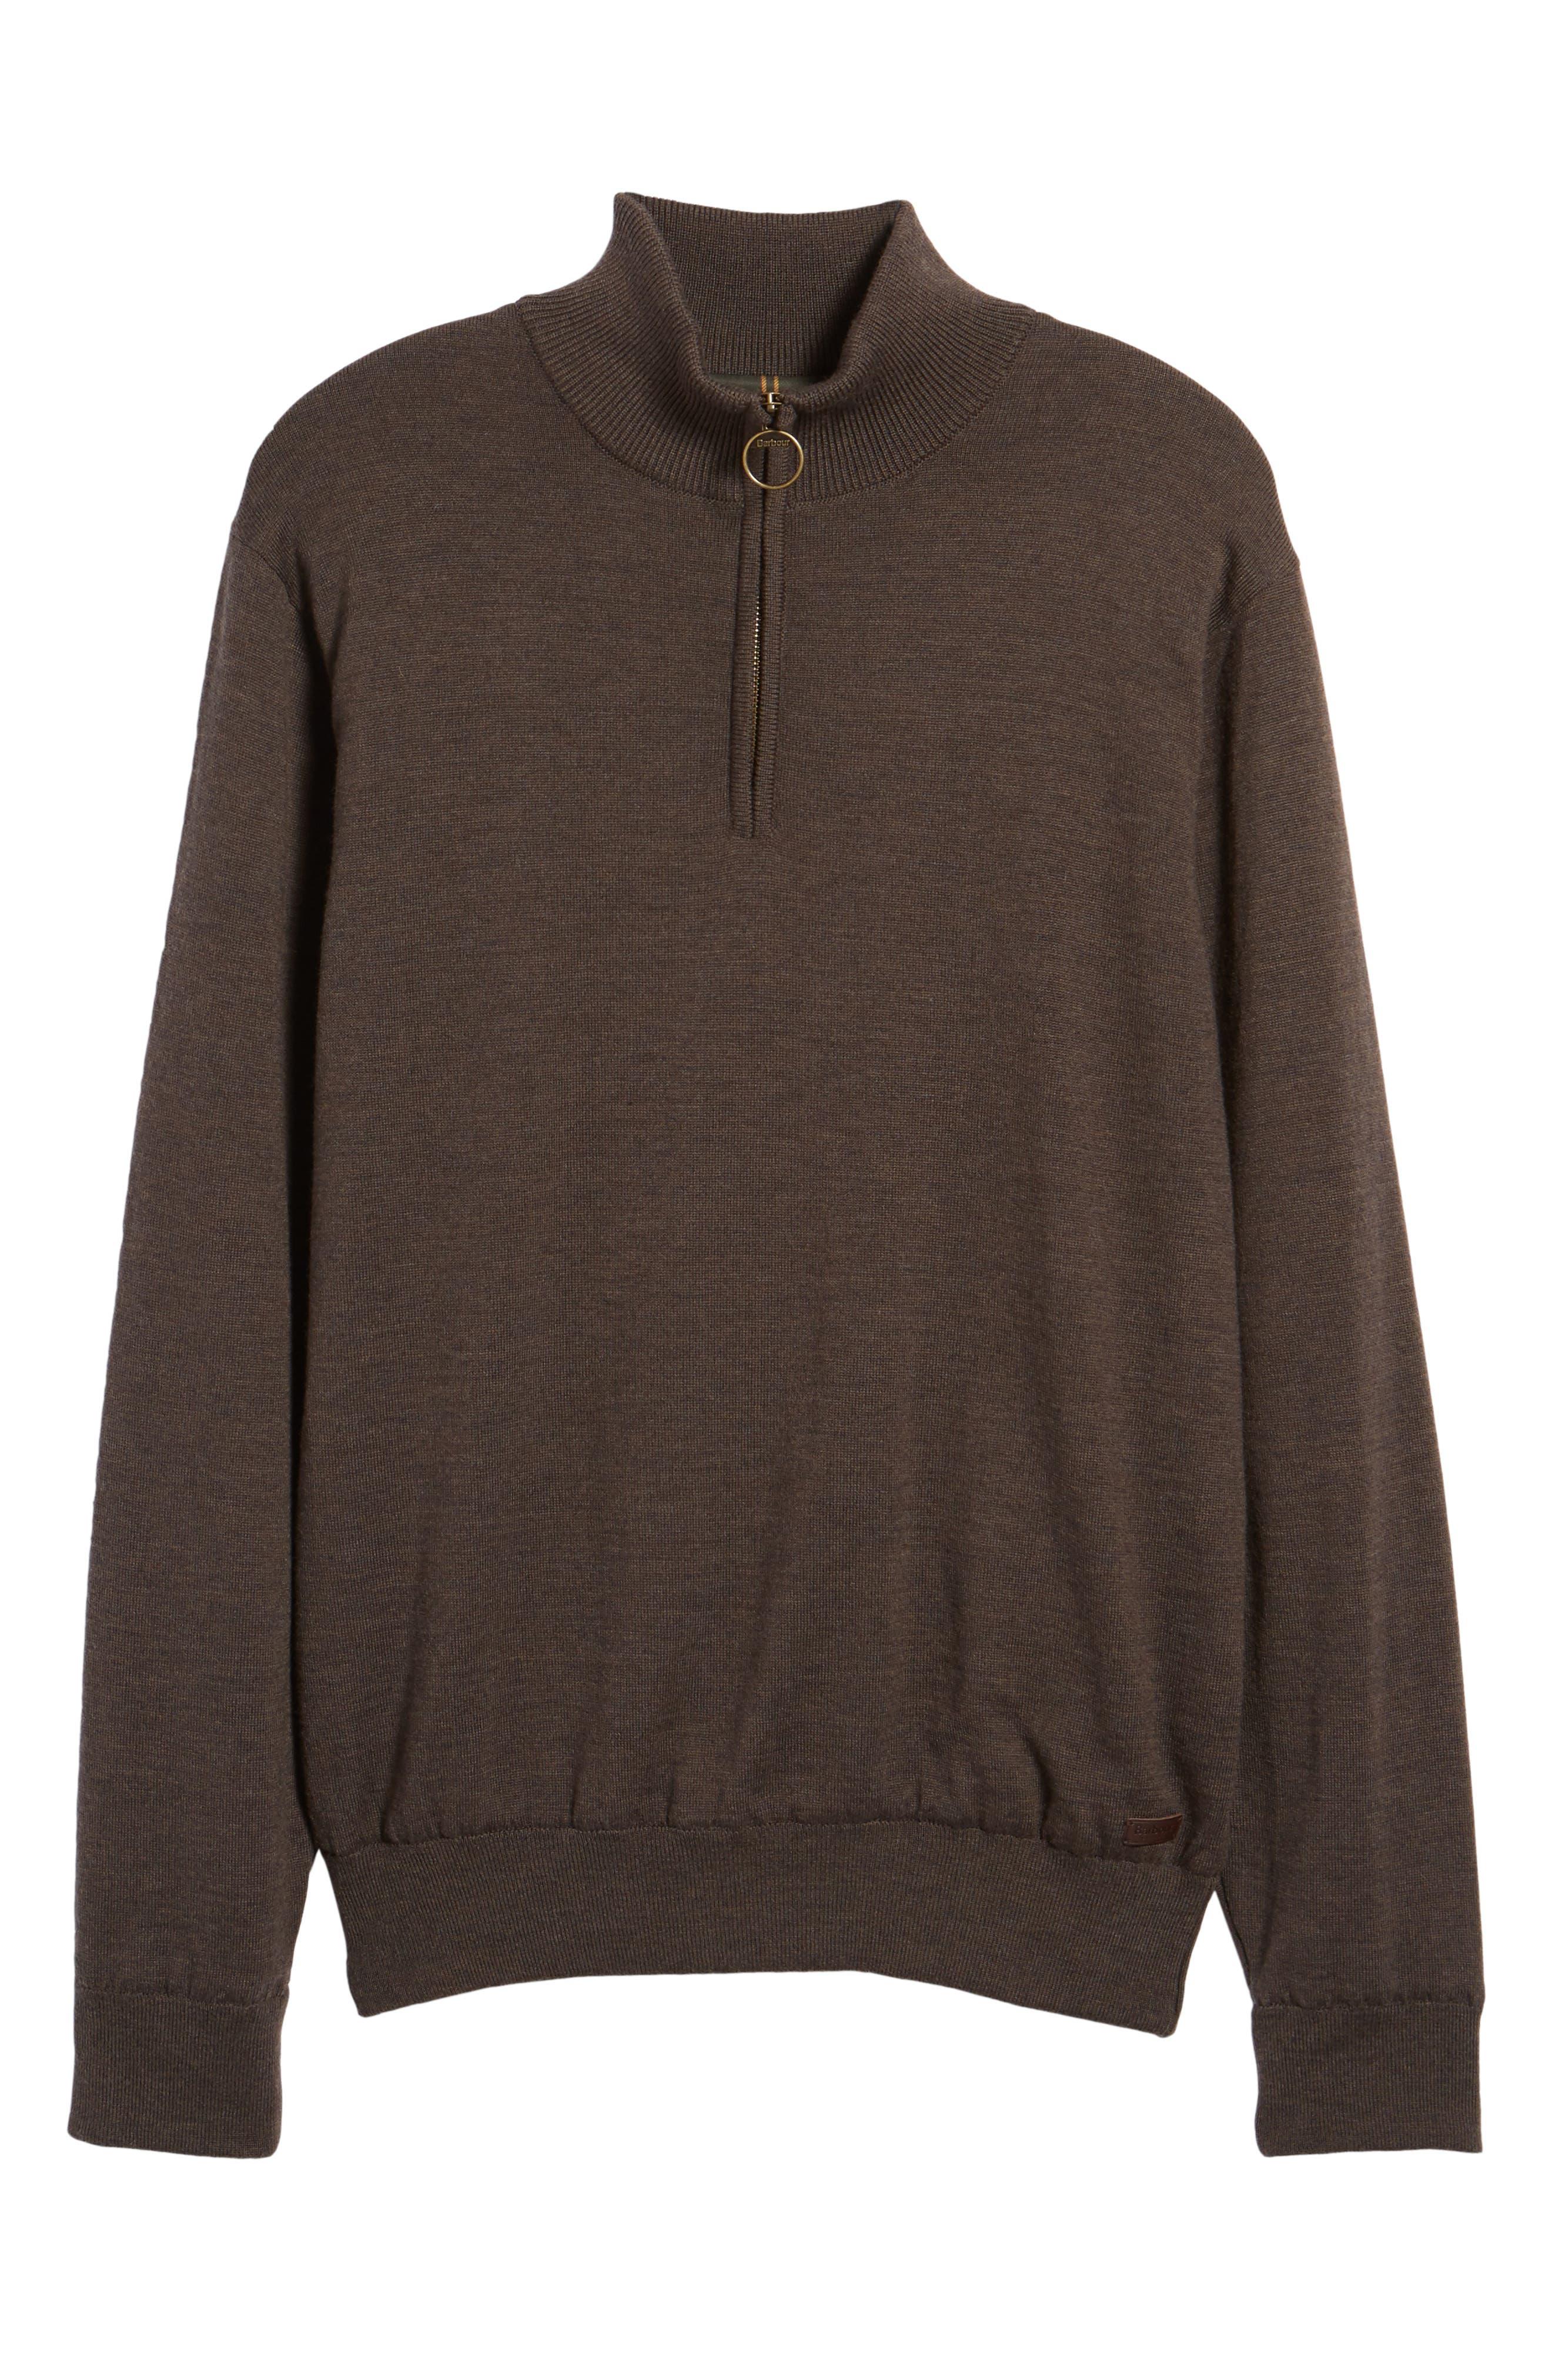 Gamlin Quarter Zip Wool Pullover,                             Alternate thumbnail 6, color,                             Rustic